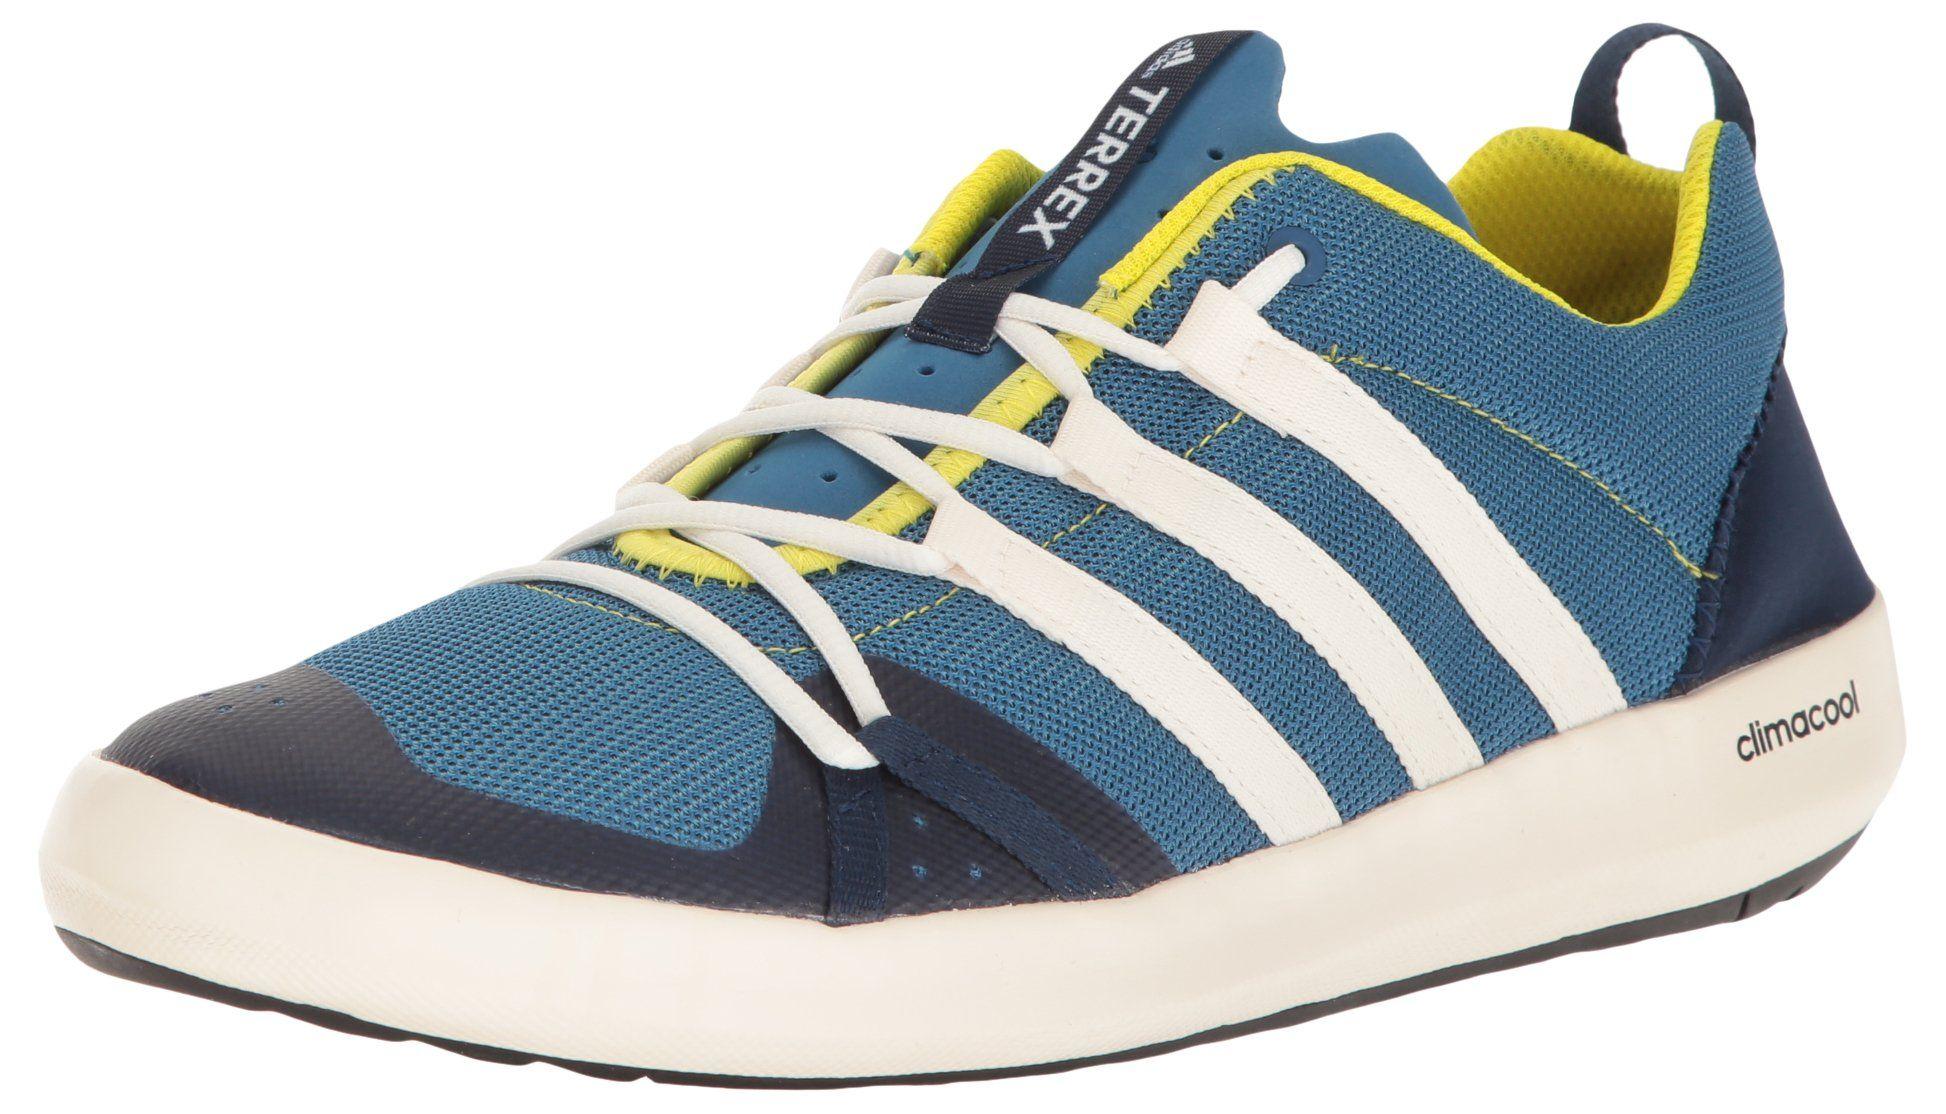 4bae291e545017 adidas Outdoor Men s Terrex Climacool Boat Water Shoe